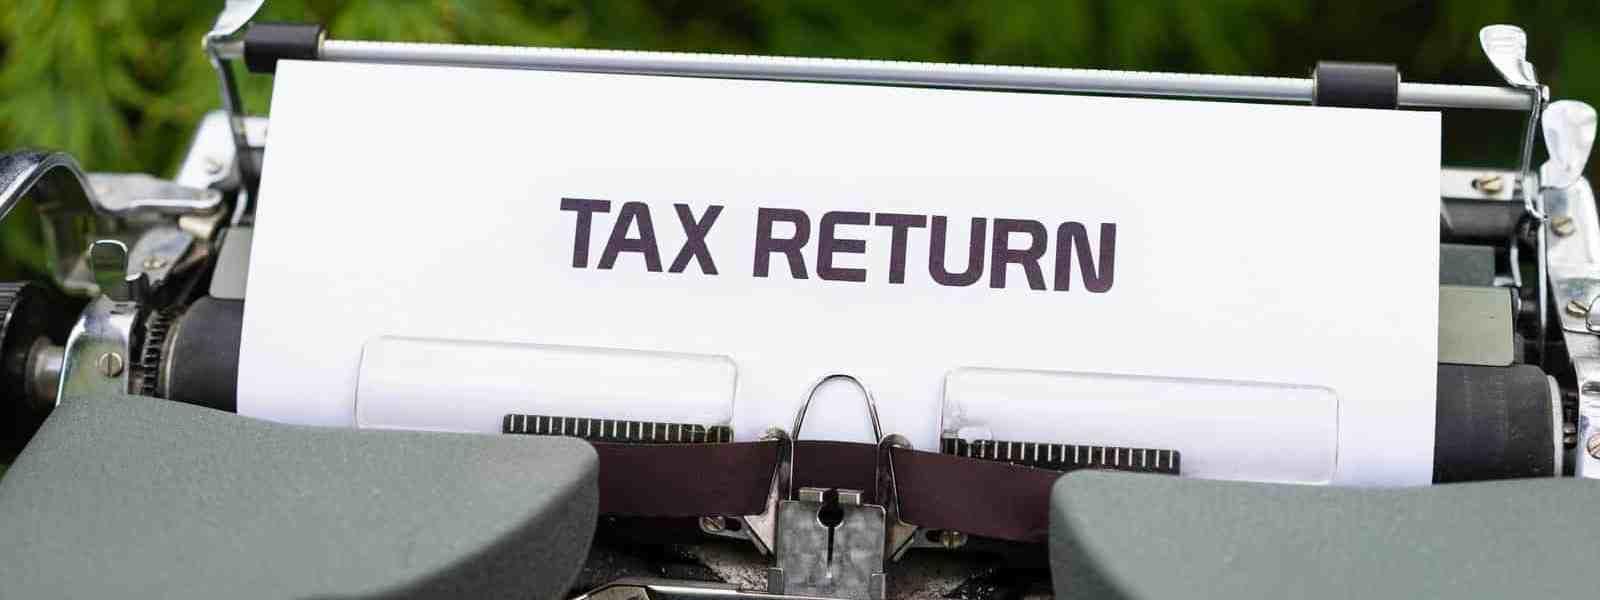 La flat taxe explication